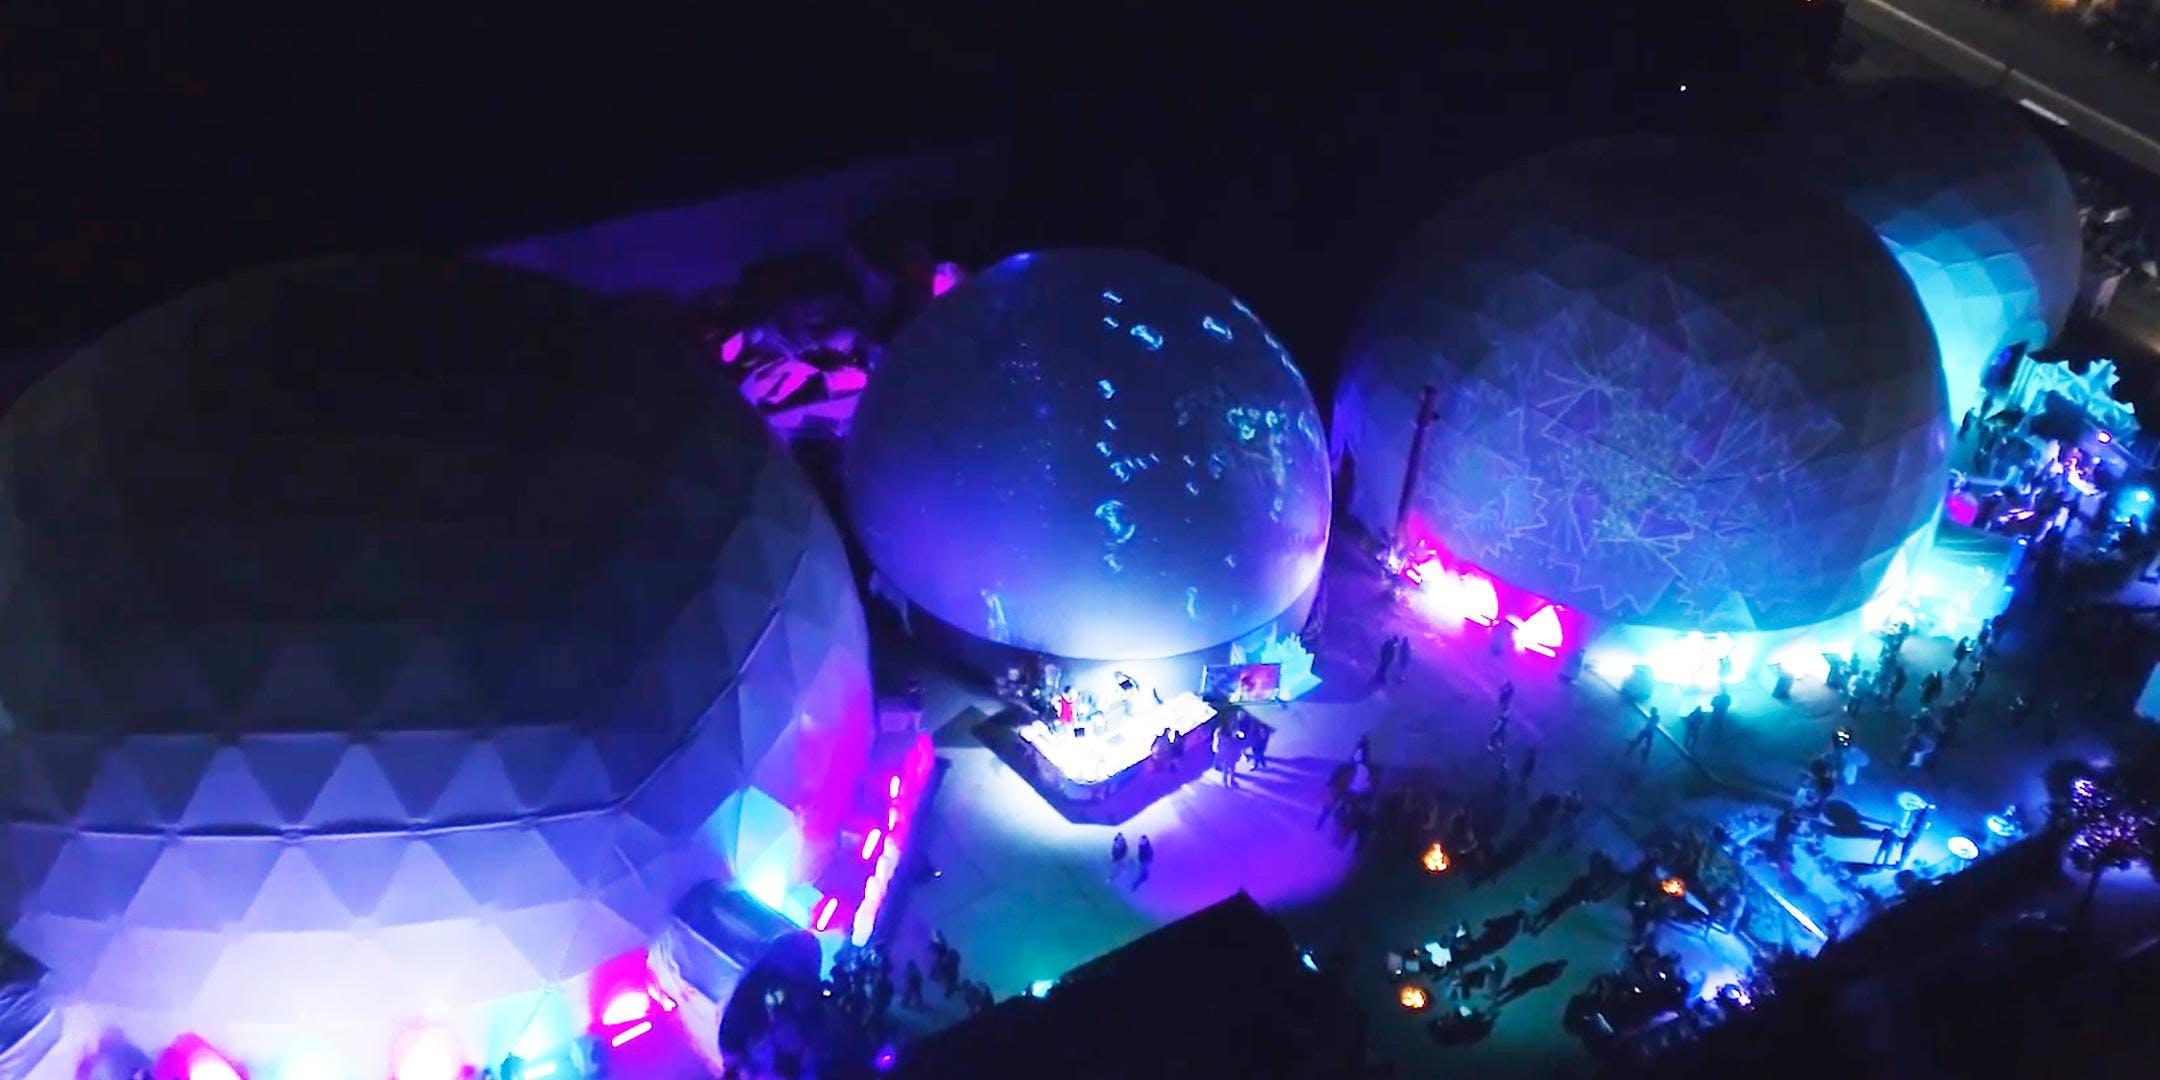 SAMSKARA - Immersive Art Experience | Arts District